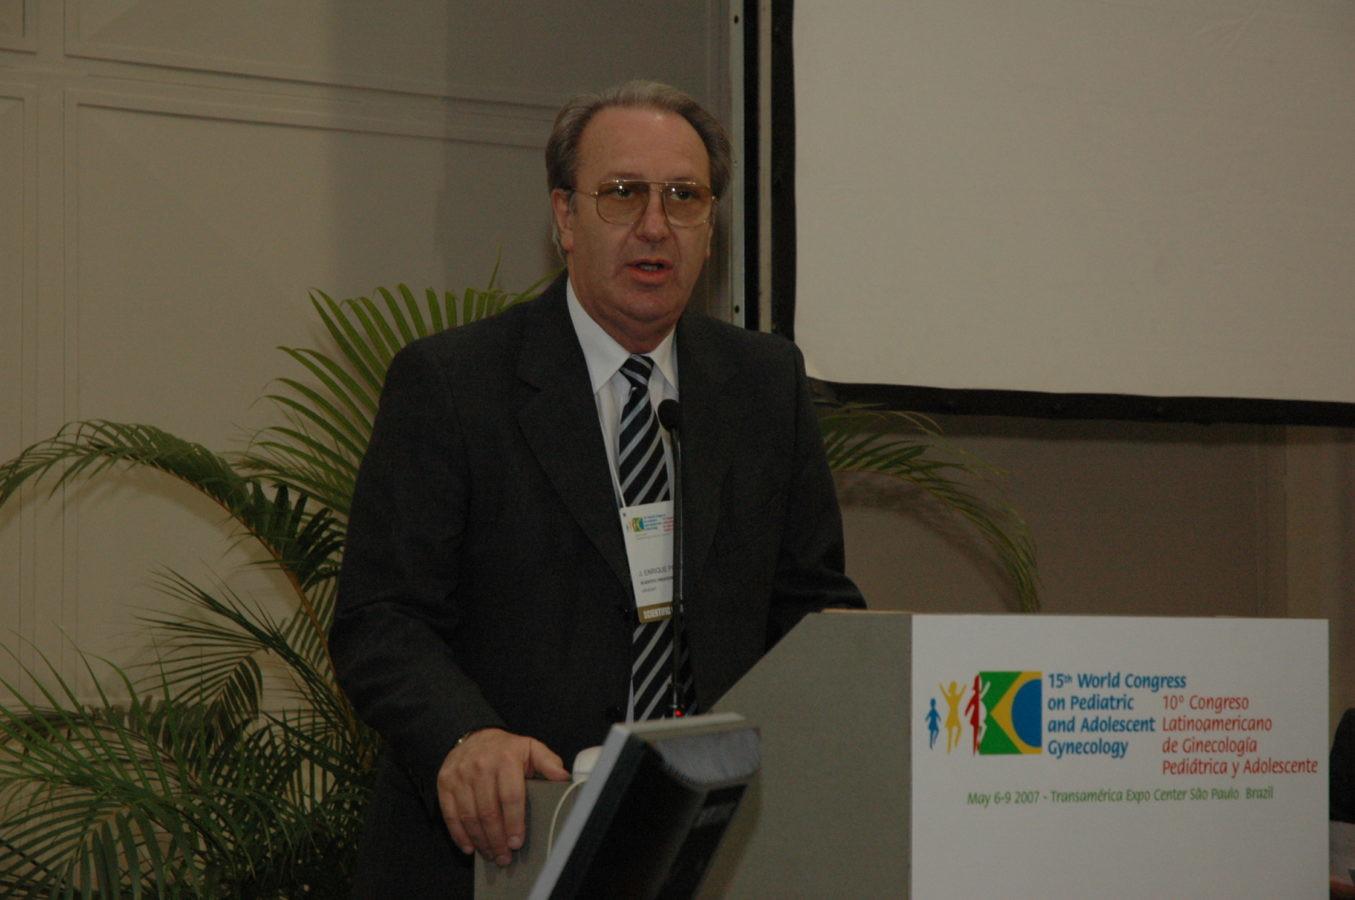 Enrique Pons - Vice-presidente dos congressos